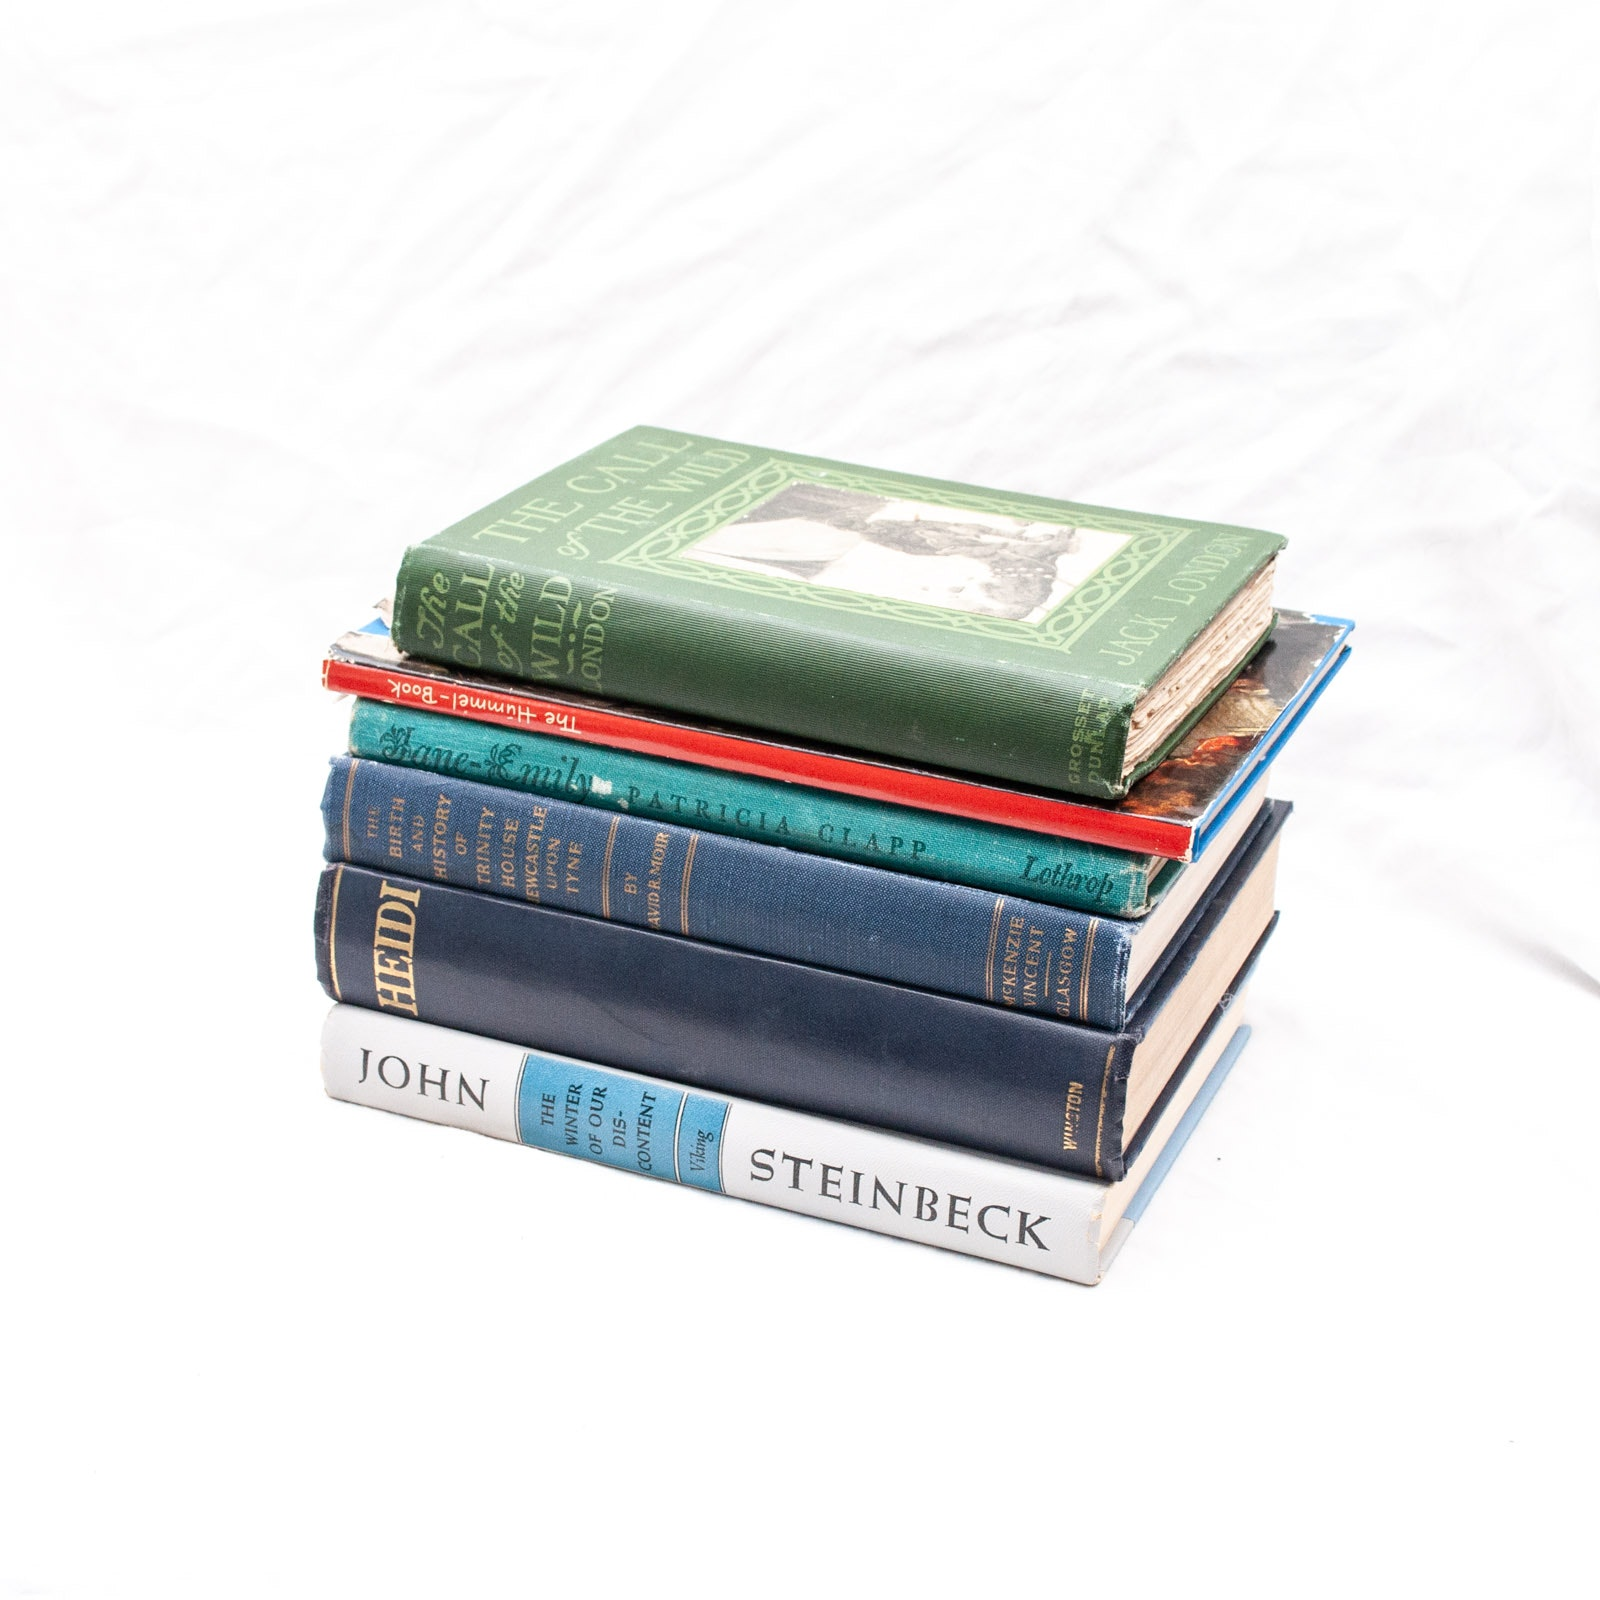 Vintage Assorted Books